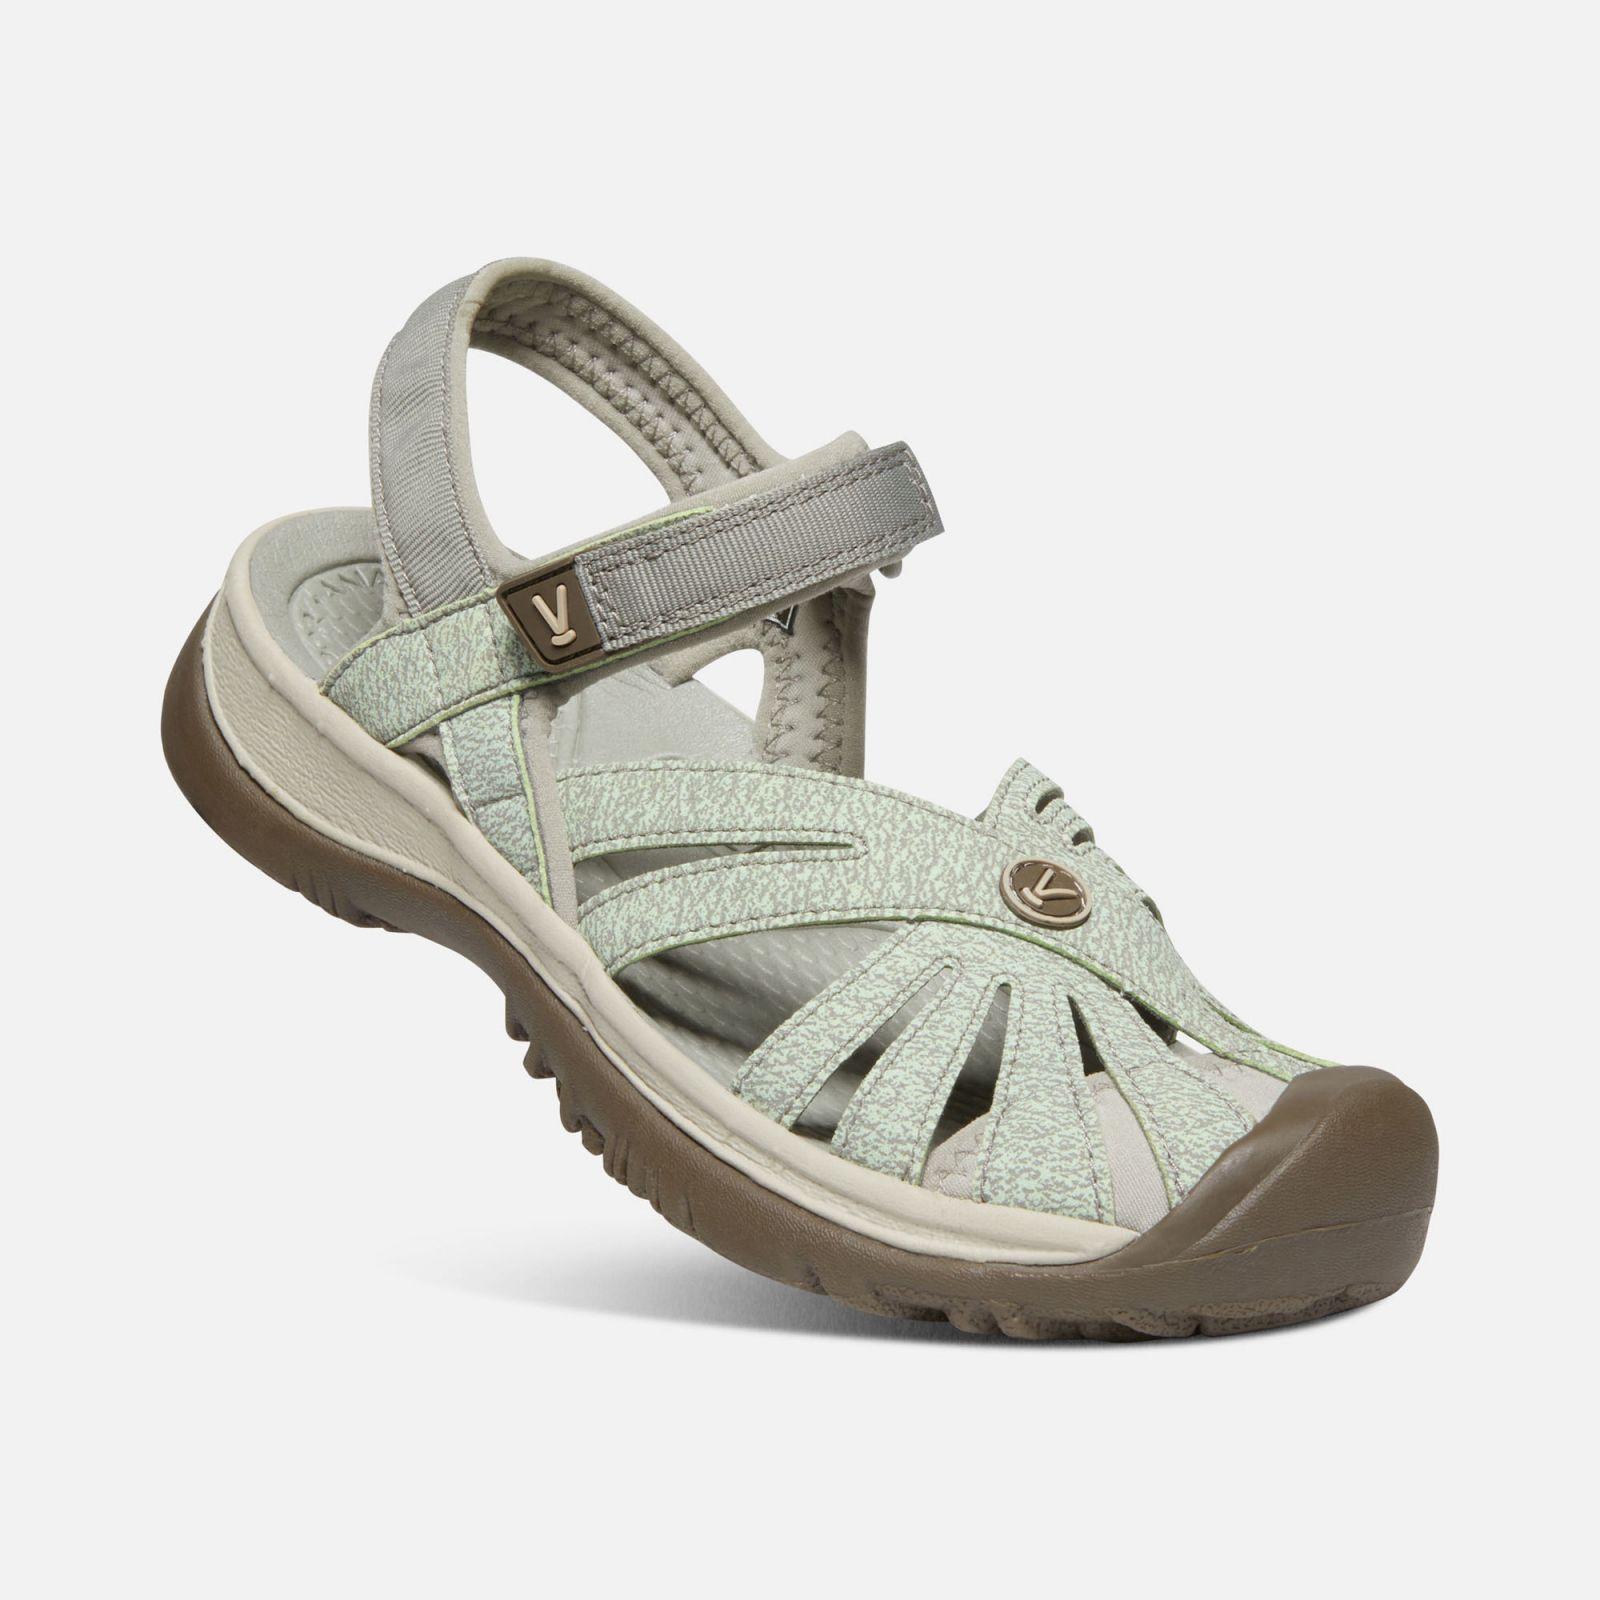 Outdoorix - KEEN Rose Sandal W Lily pad / Celadon Dámský sandál